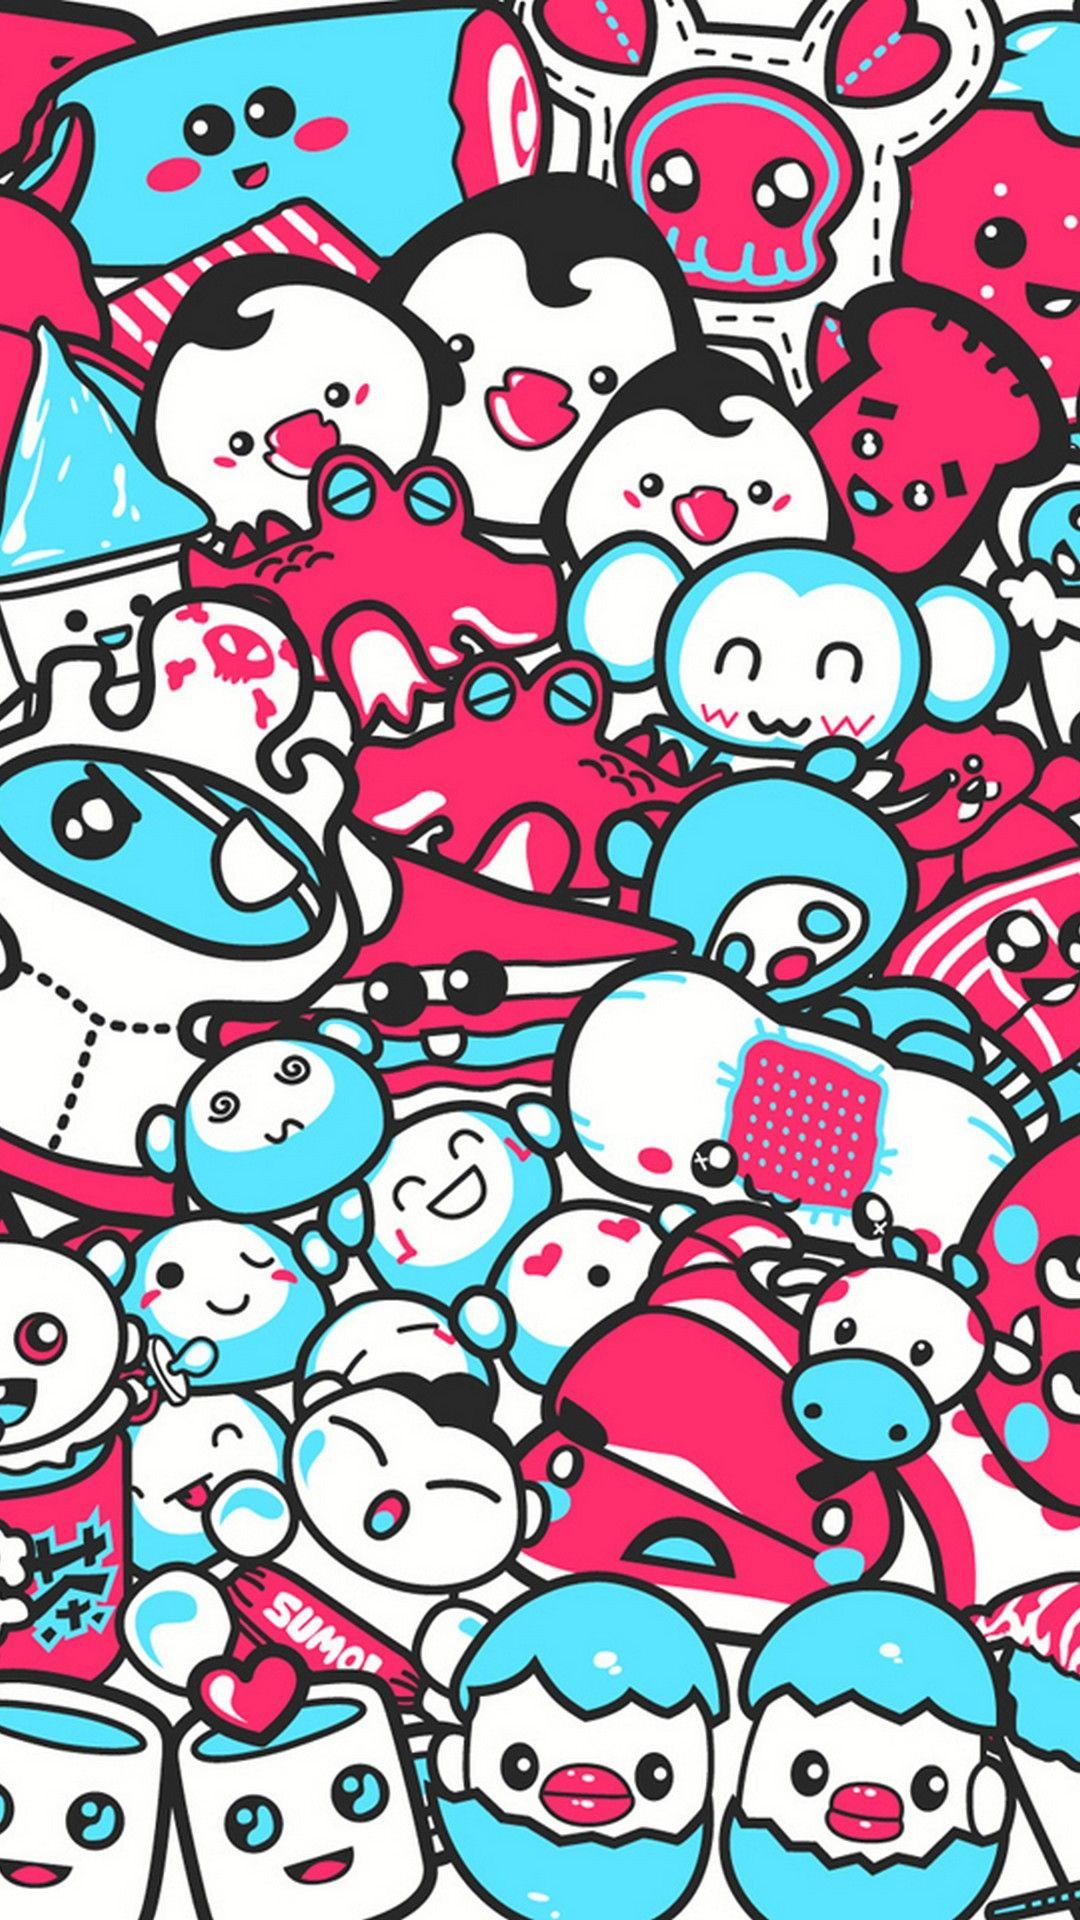 Hd Wallpaper Cute Girly Iphone Best Hd Wallpapers Wallpaperscute